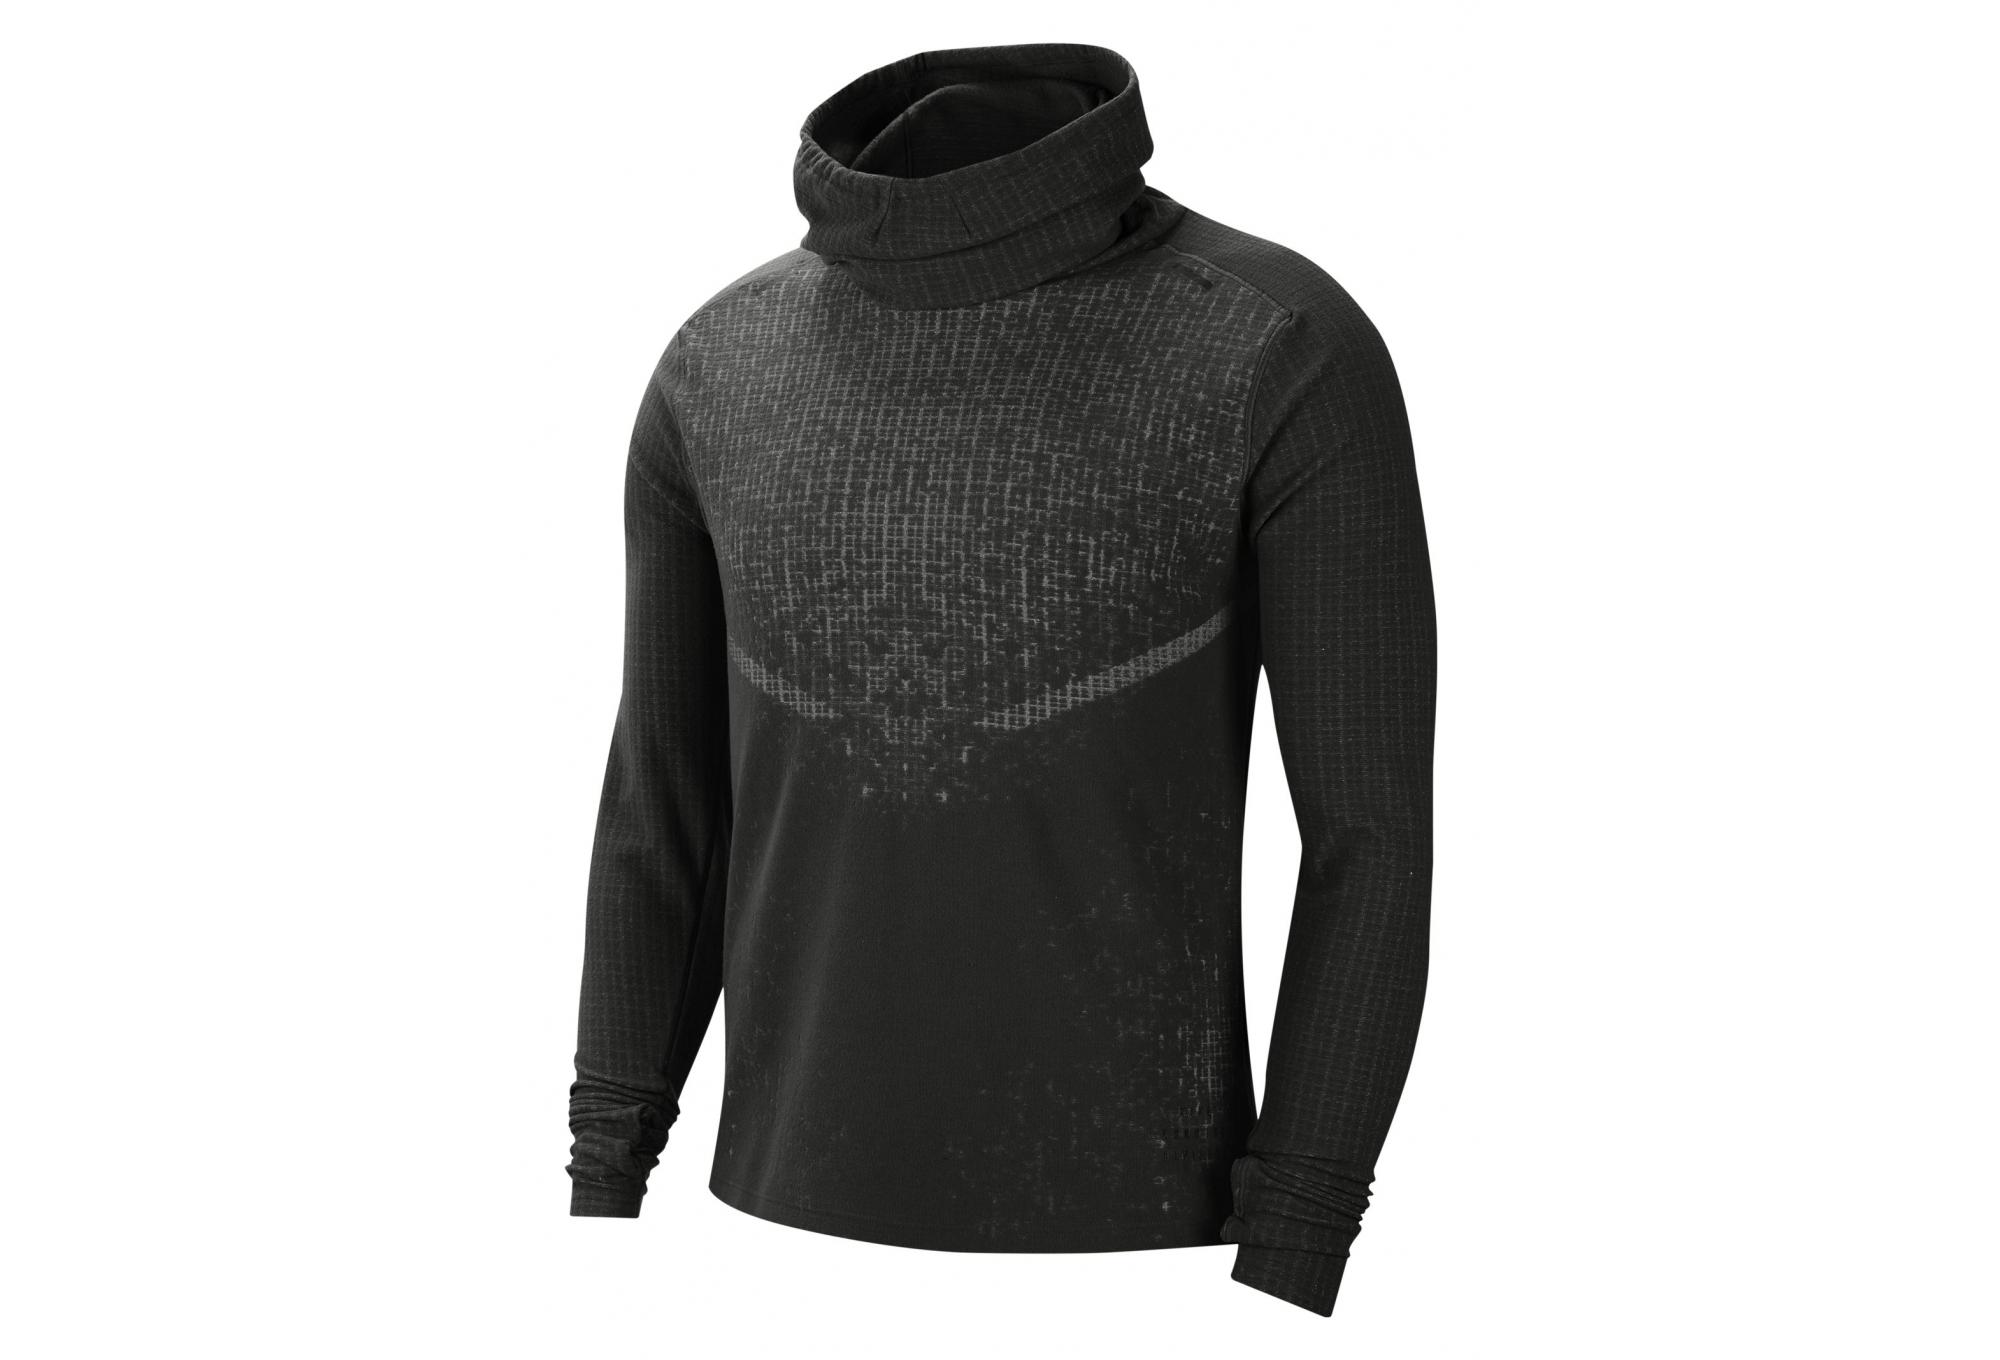 Contemporáneo Transitorio Barriga  Nike Run Division Wooldorado Top Black Men | Alltricks.com